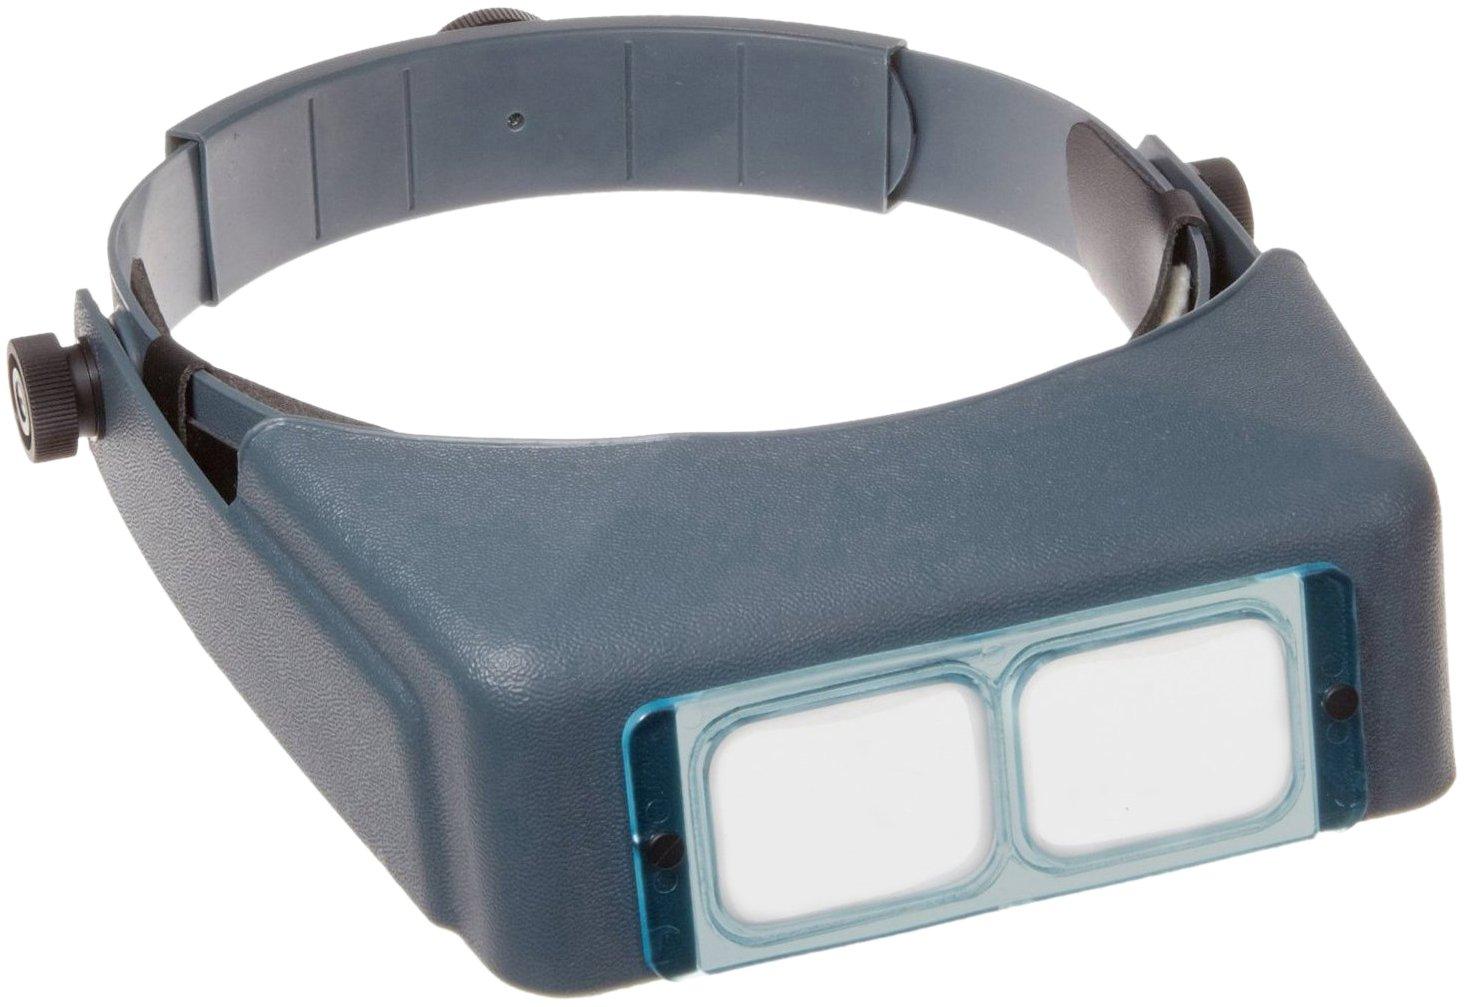 Max 40% OFF Donegan Fees free DA-4 OptiVISOR Headband 2X Magnification Glas Magnifier